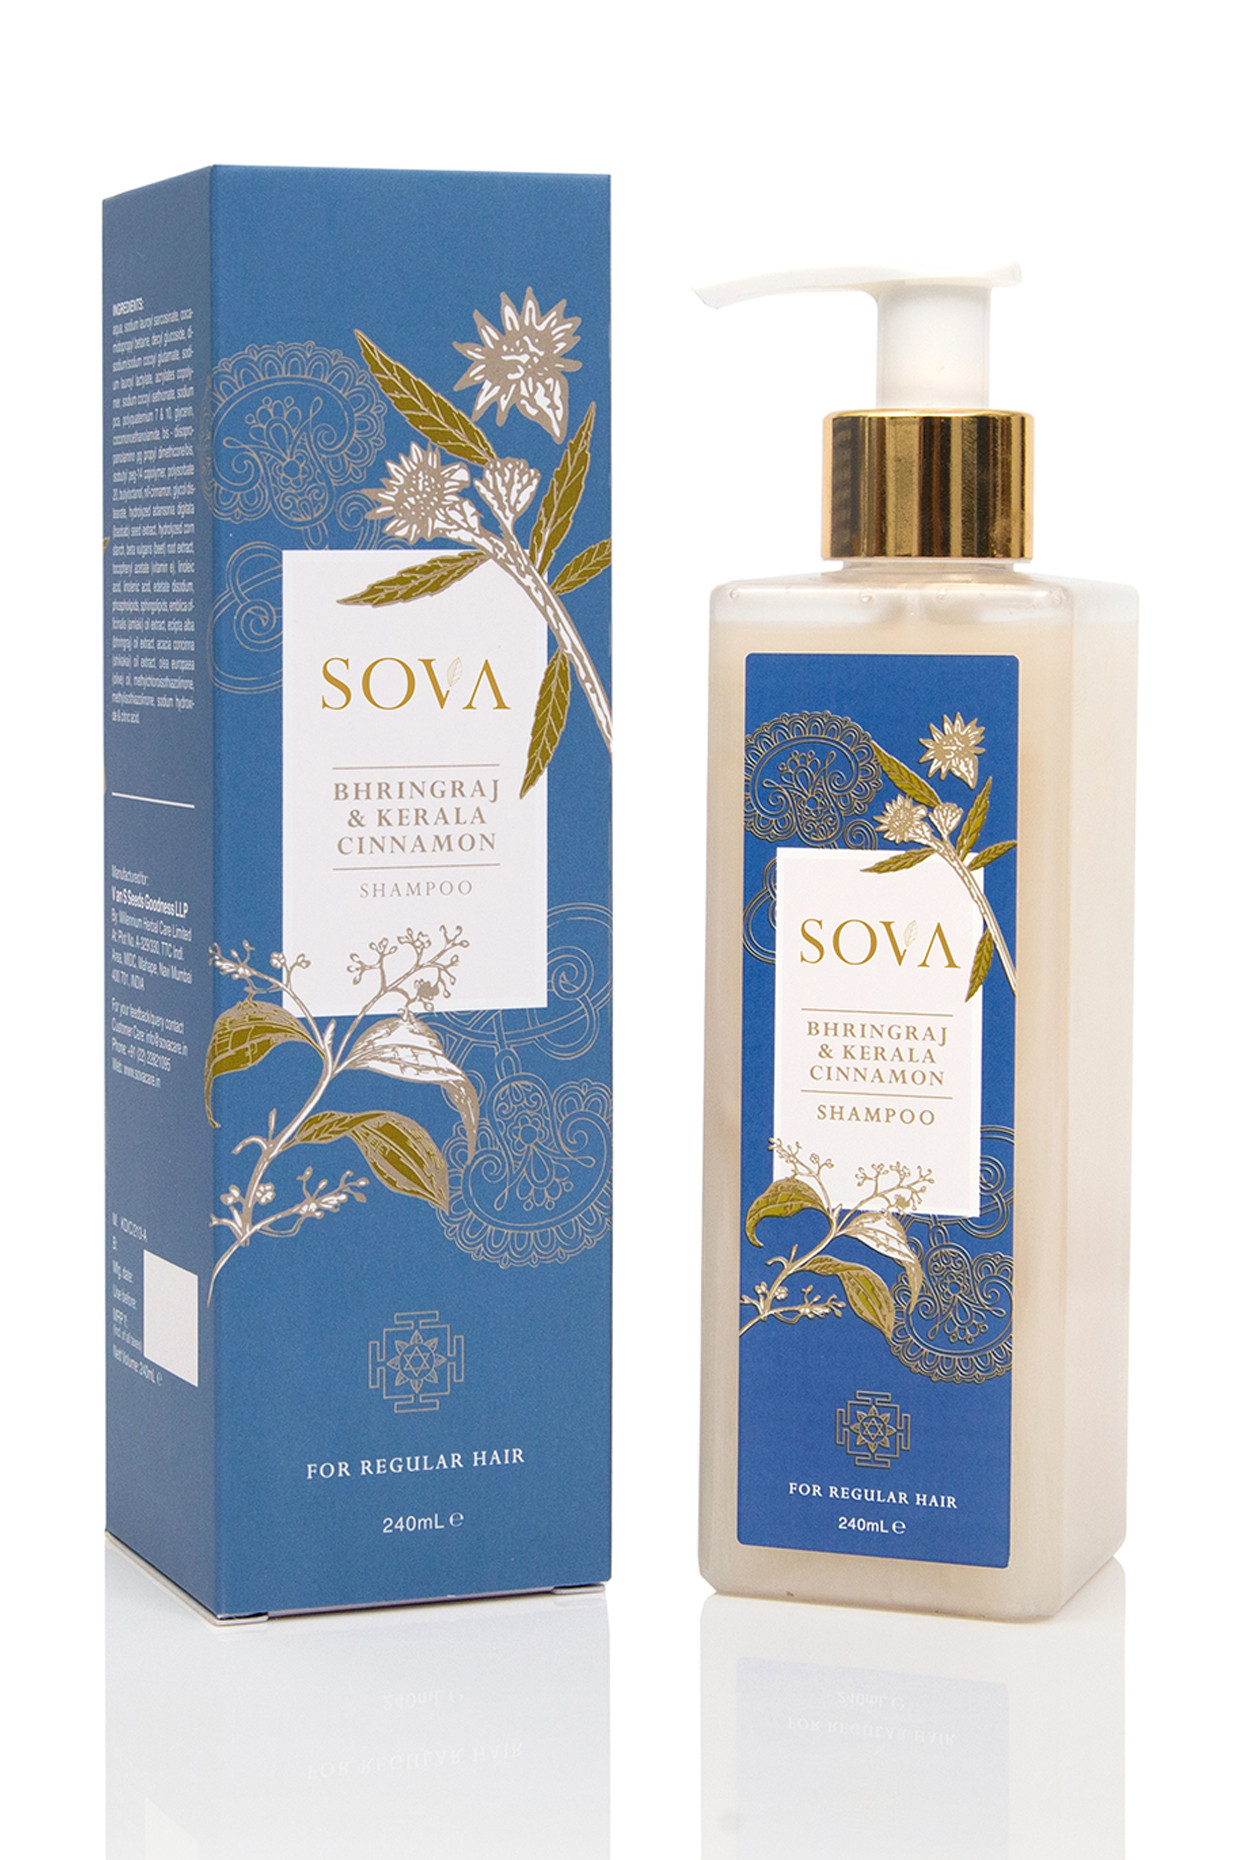 Kerela Cinnamon & Bhringraj Shampoo For Regular Hair by SOVA